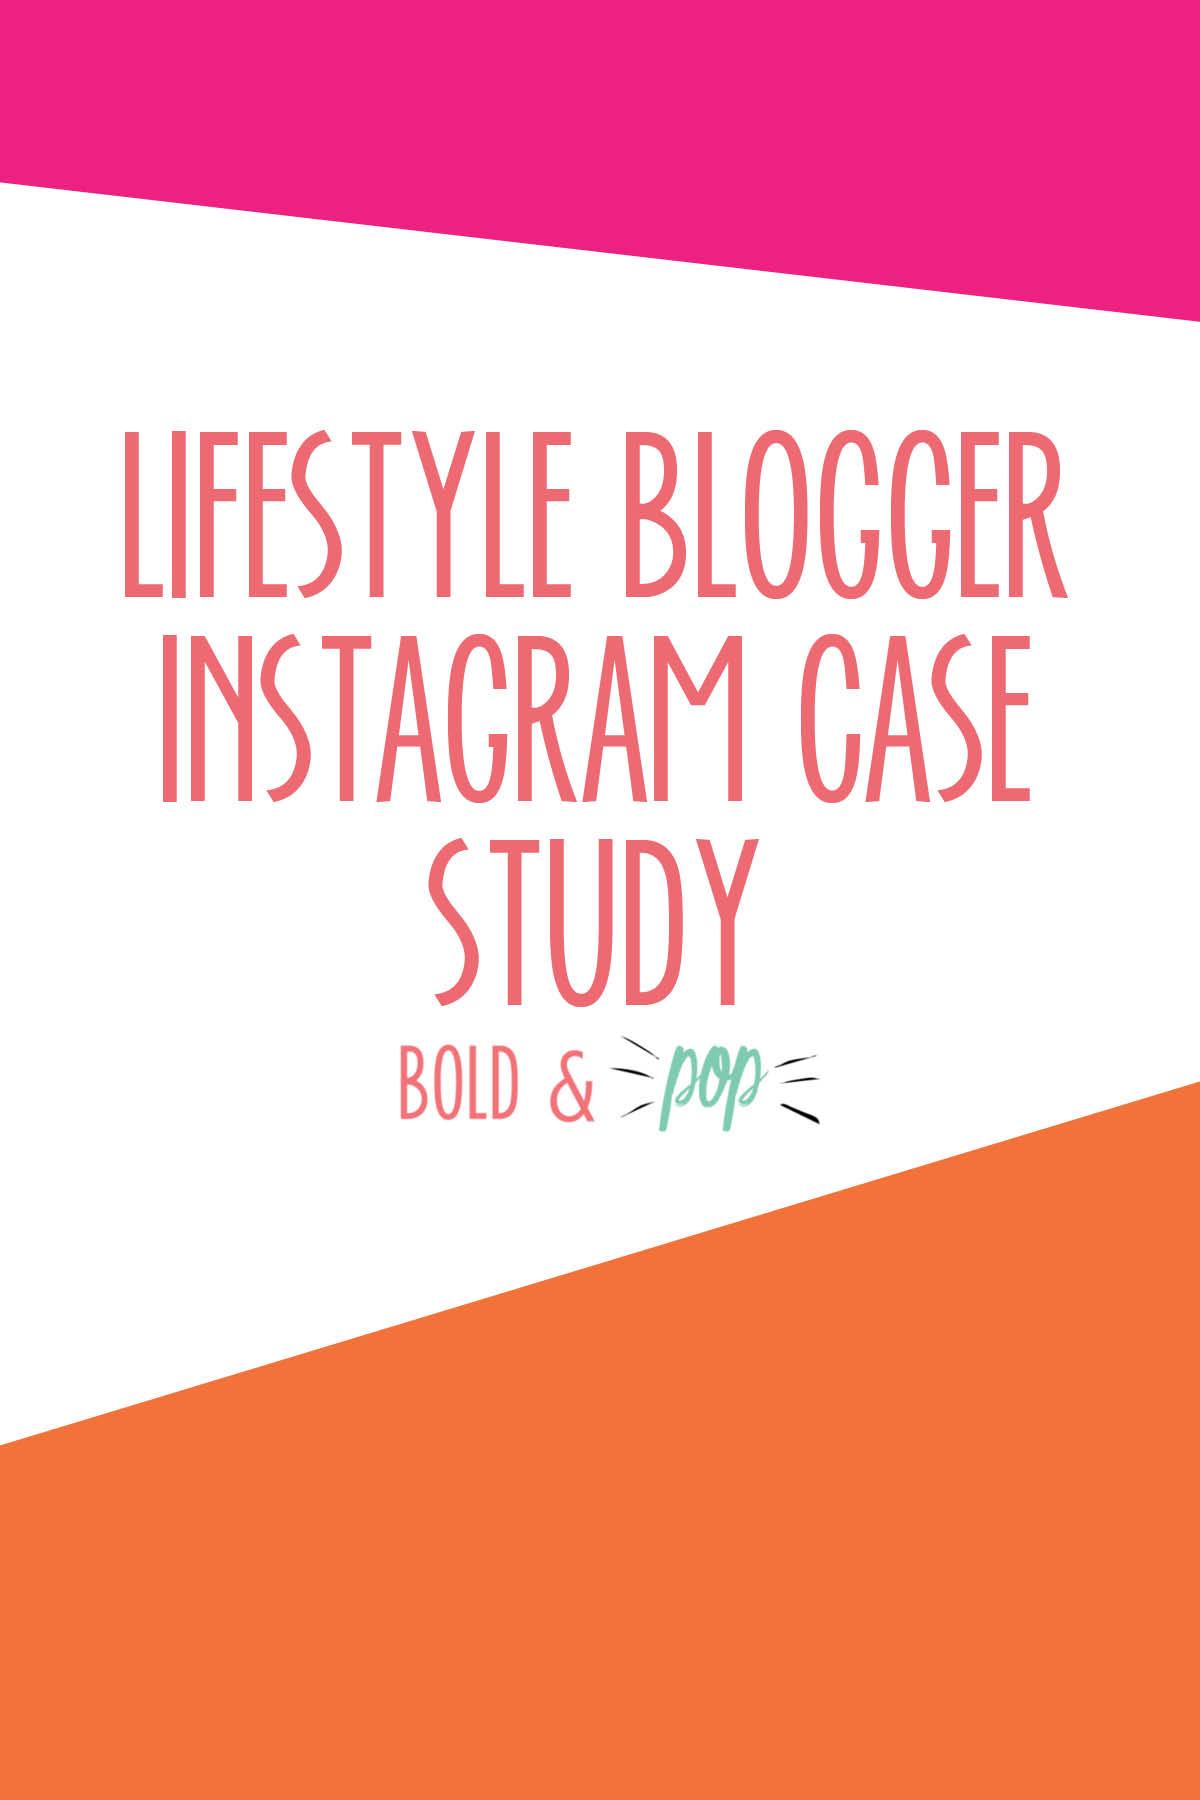 Bold & Pop : Social Media Agency Lifestyle Blogger Instagram Case Study